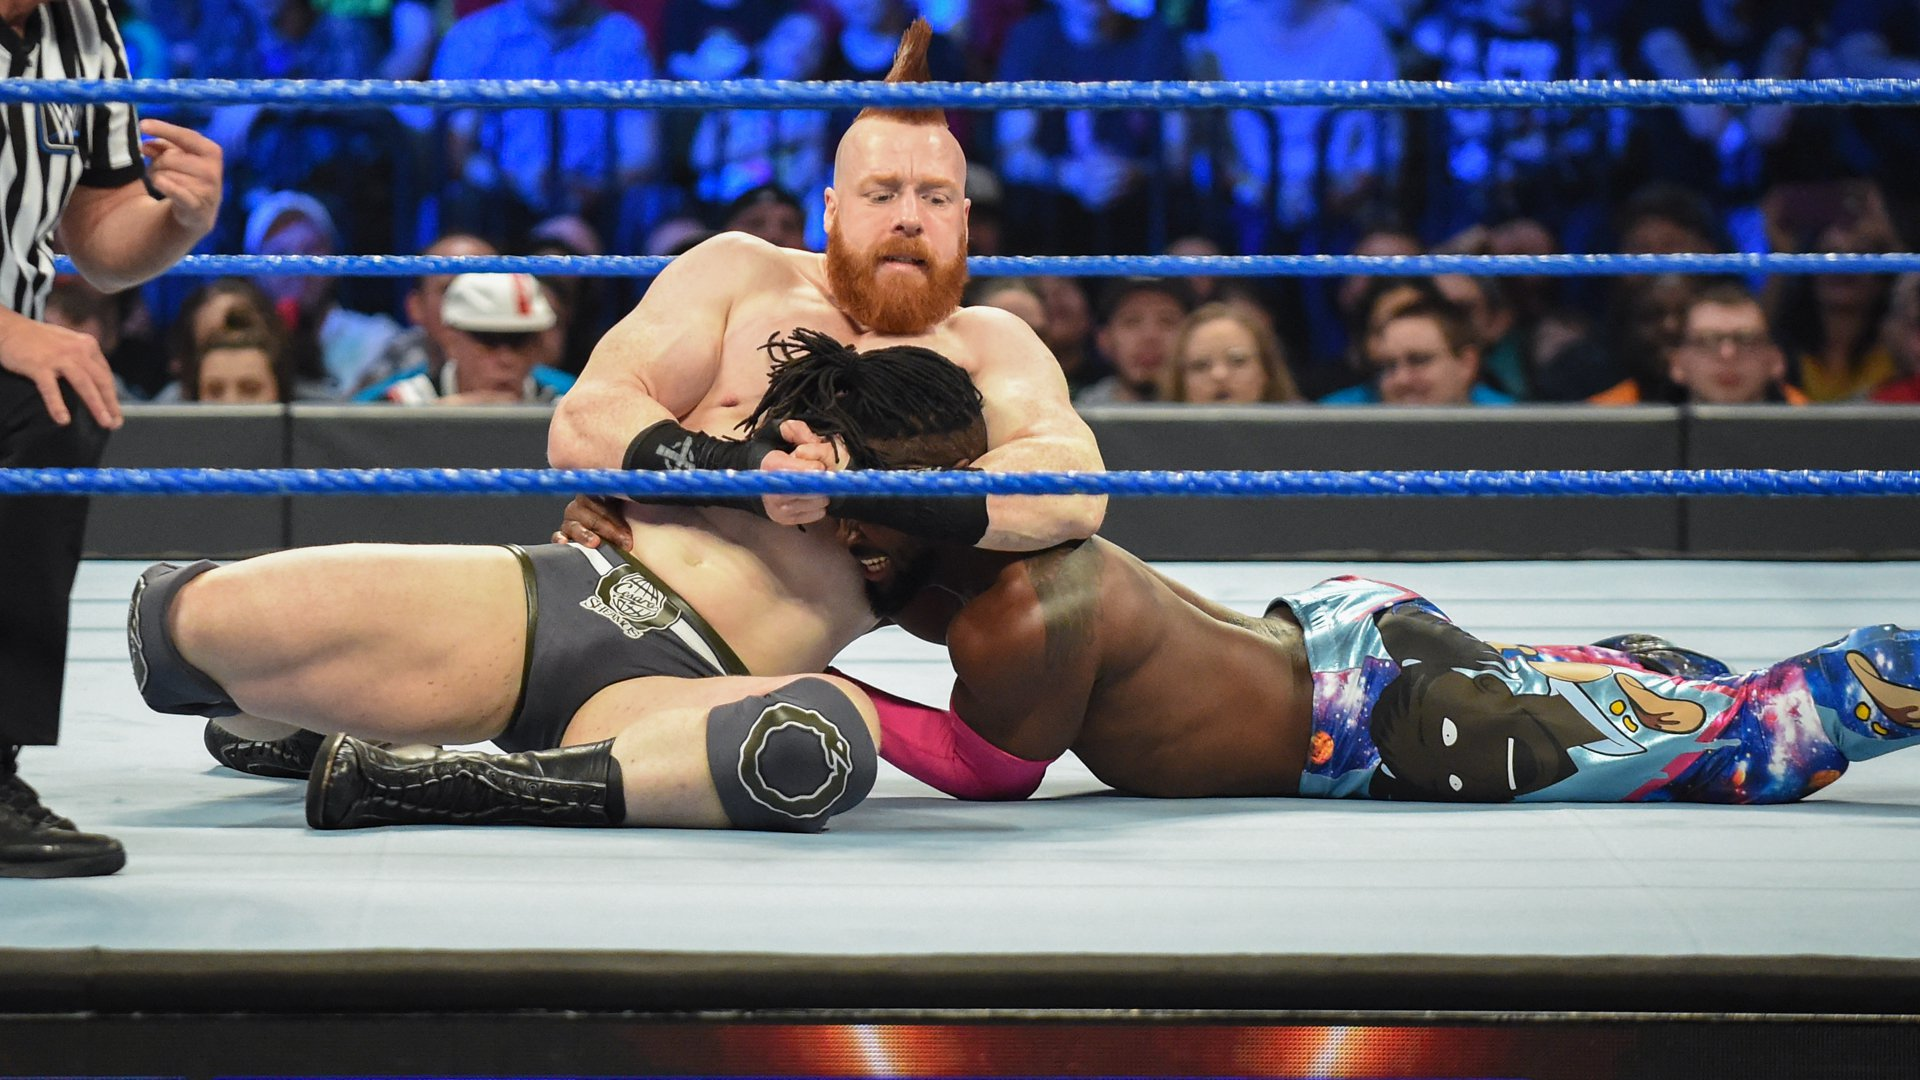 Sheamus is Kofi's first opponent!